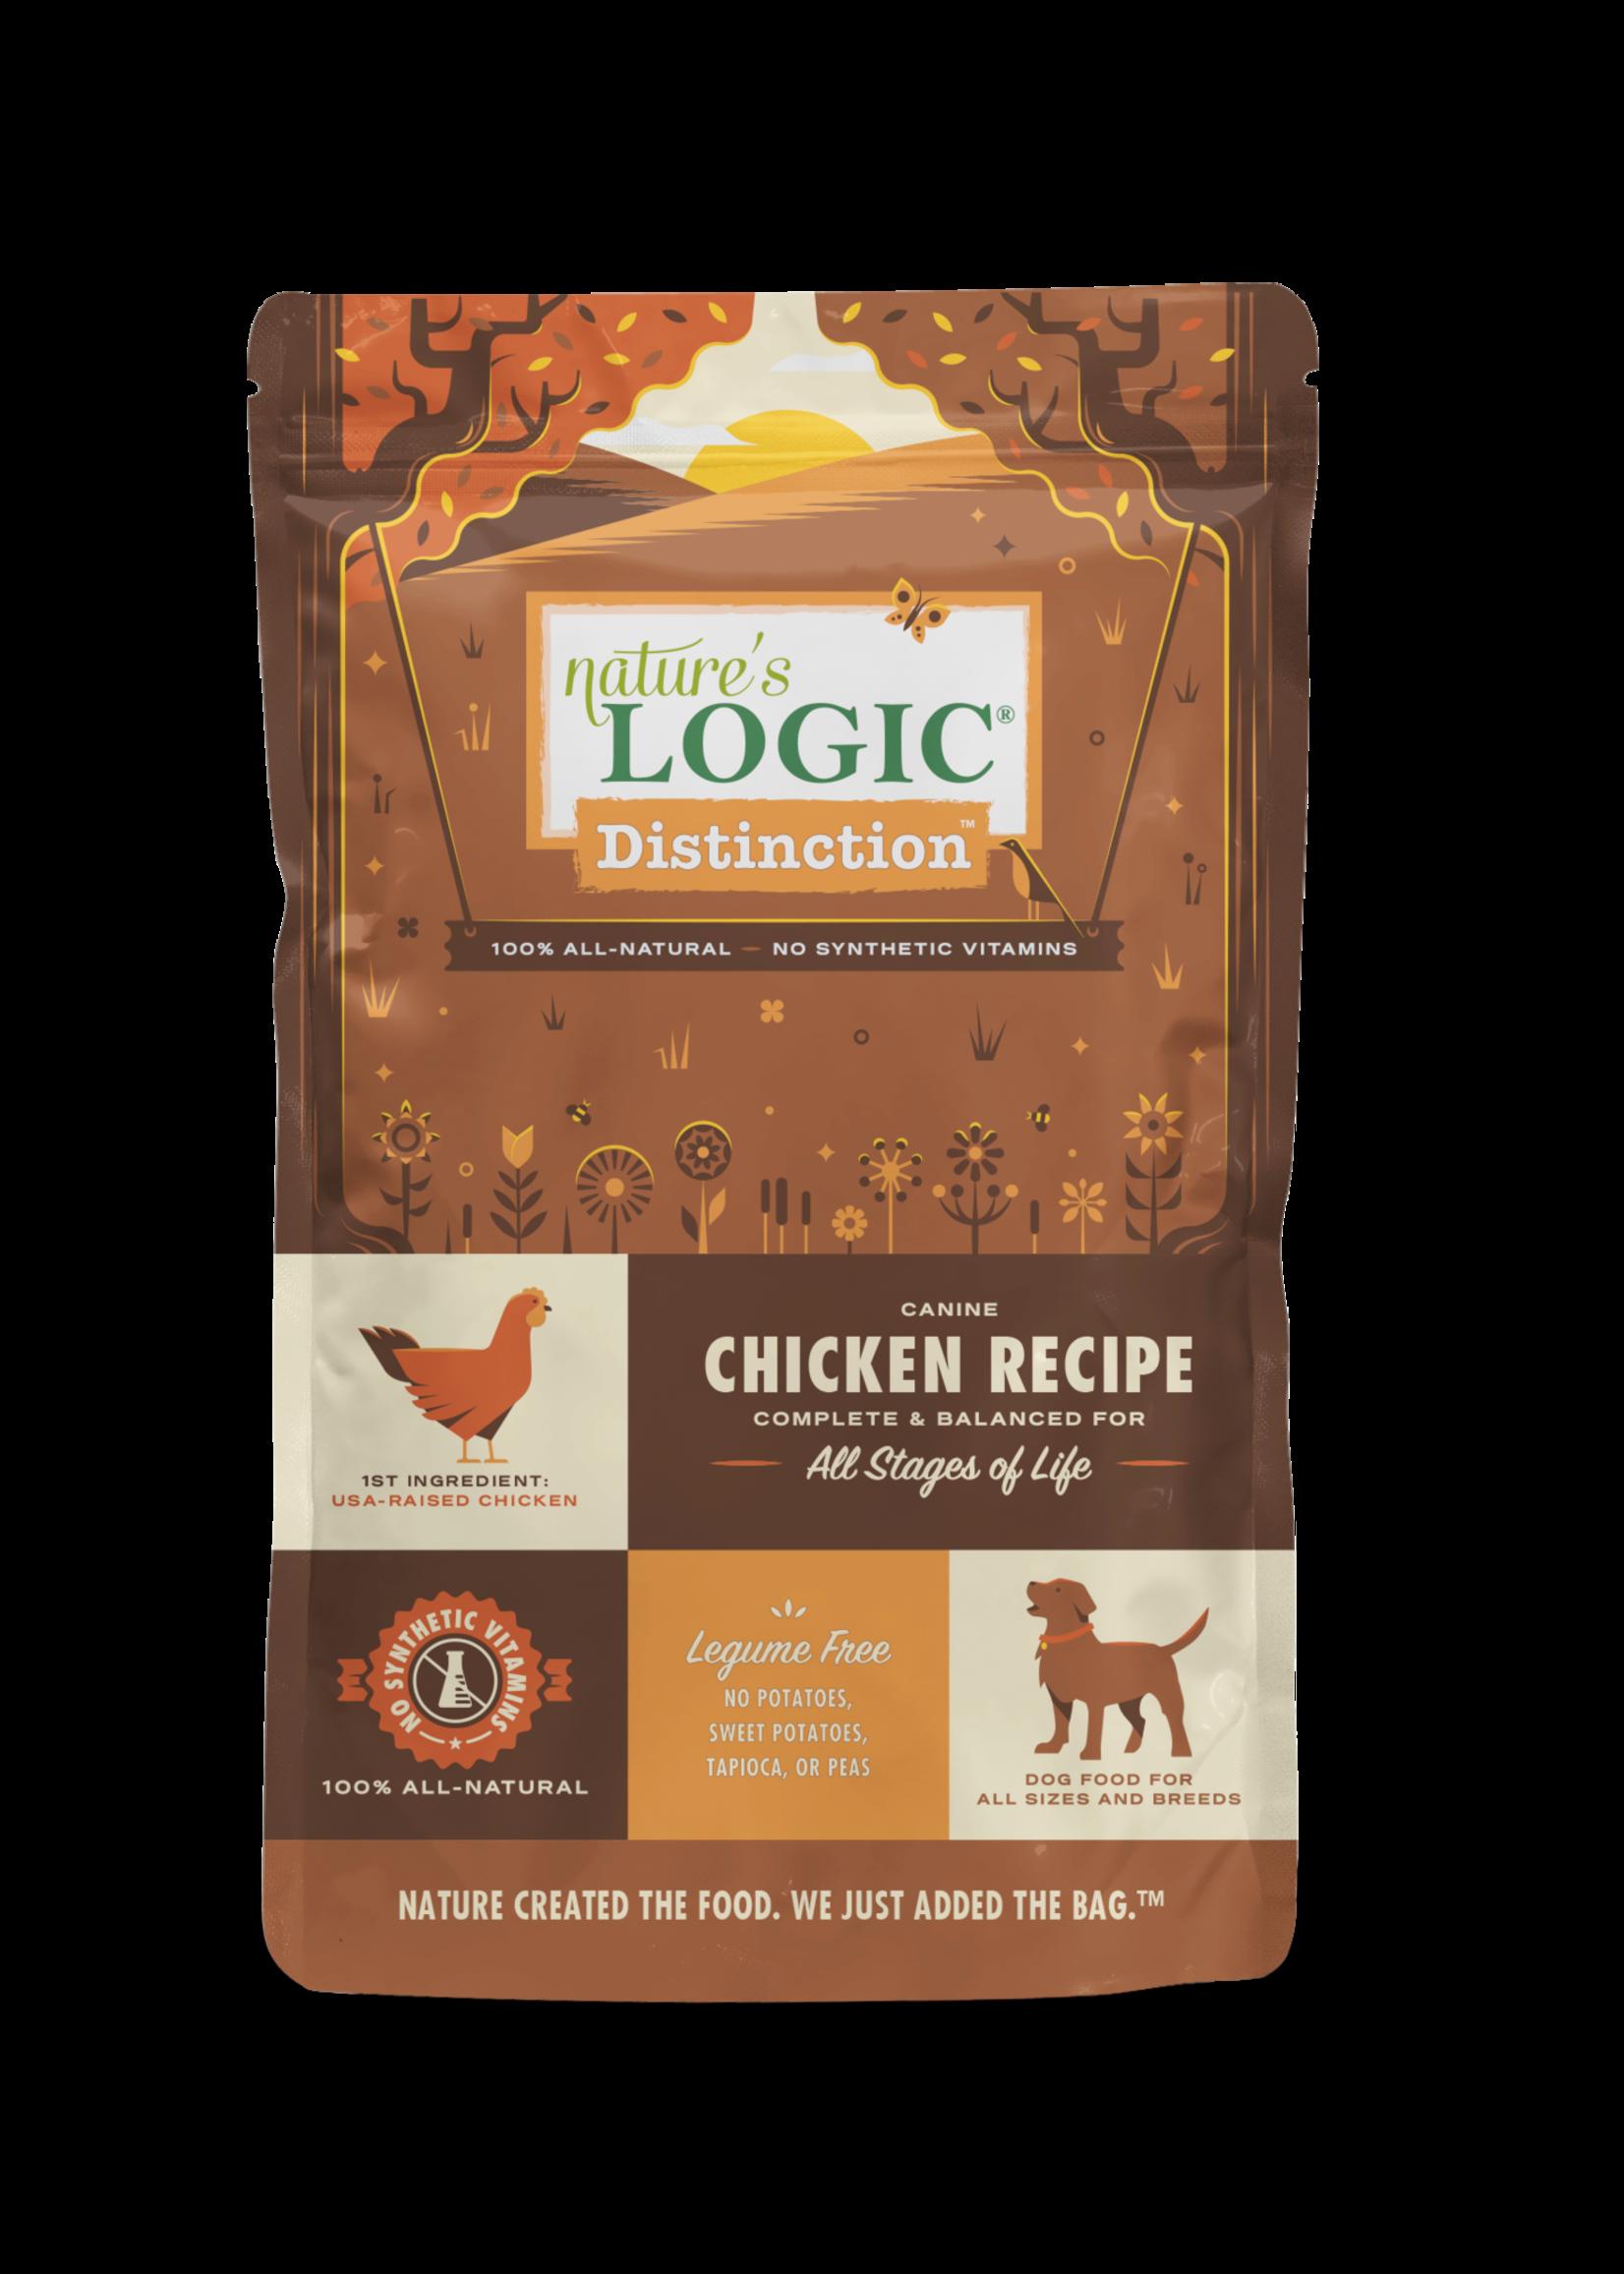 Nature's Logic Nature's Logic Distinction Chicken Dry Dog Food 24lbs